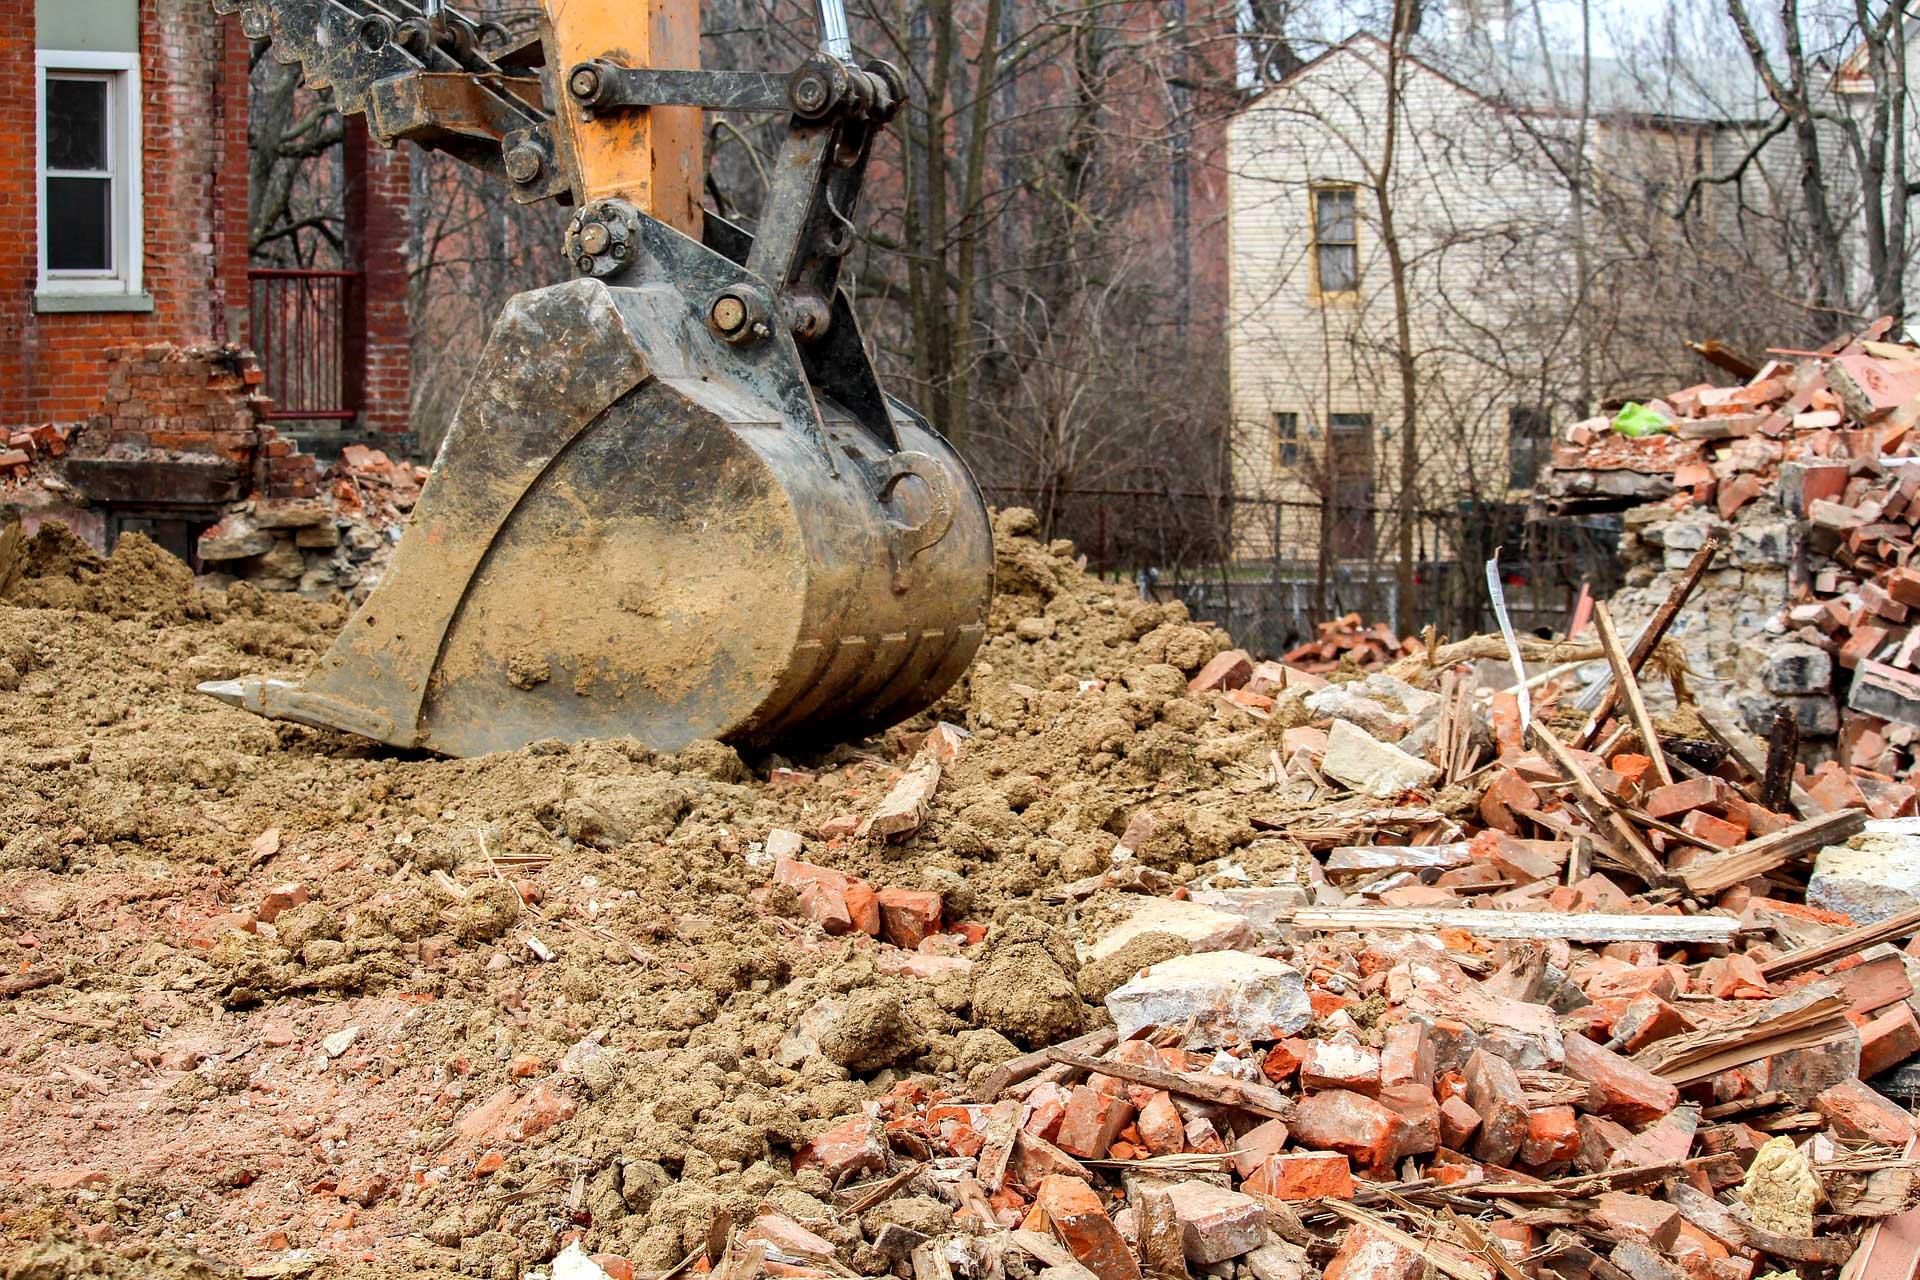 Demolition Waste-Riverside Dumpster Rental & Junk Removal Services-We Offer Residential and Commercial Dumpster Removal Services, Portable Toilet Services, Dumpster Rentals, Bulk Trash, Demolition Removal, Junk Hauling, Rubbish Removal, Waste Containers, Debris Removal, 20 & 30 Yard Container Rentals, and much more!